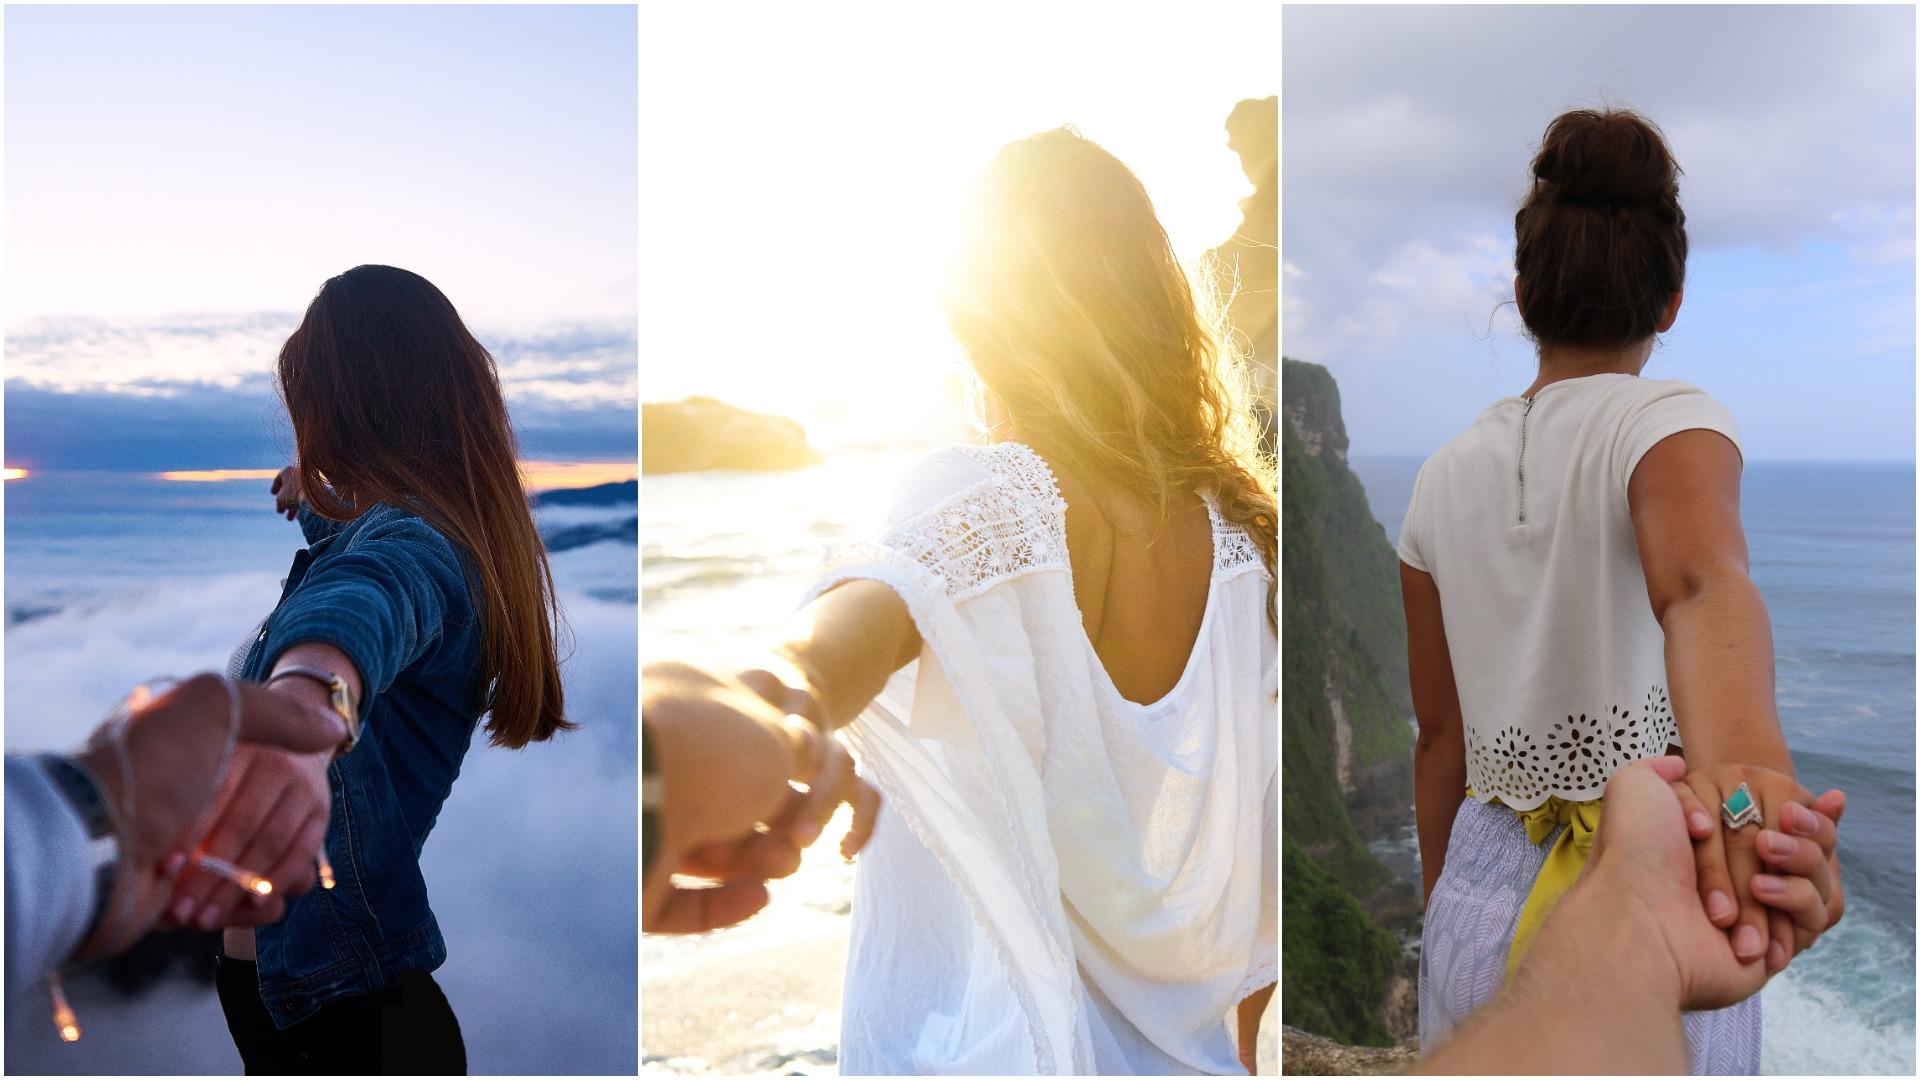 Instagram couples | © Unsplash